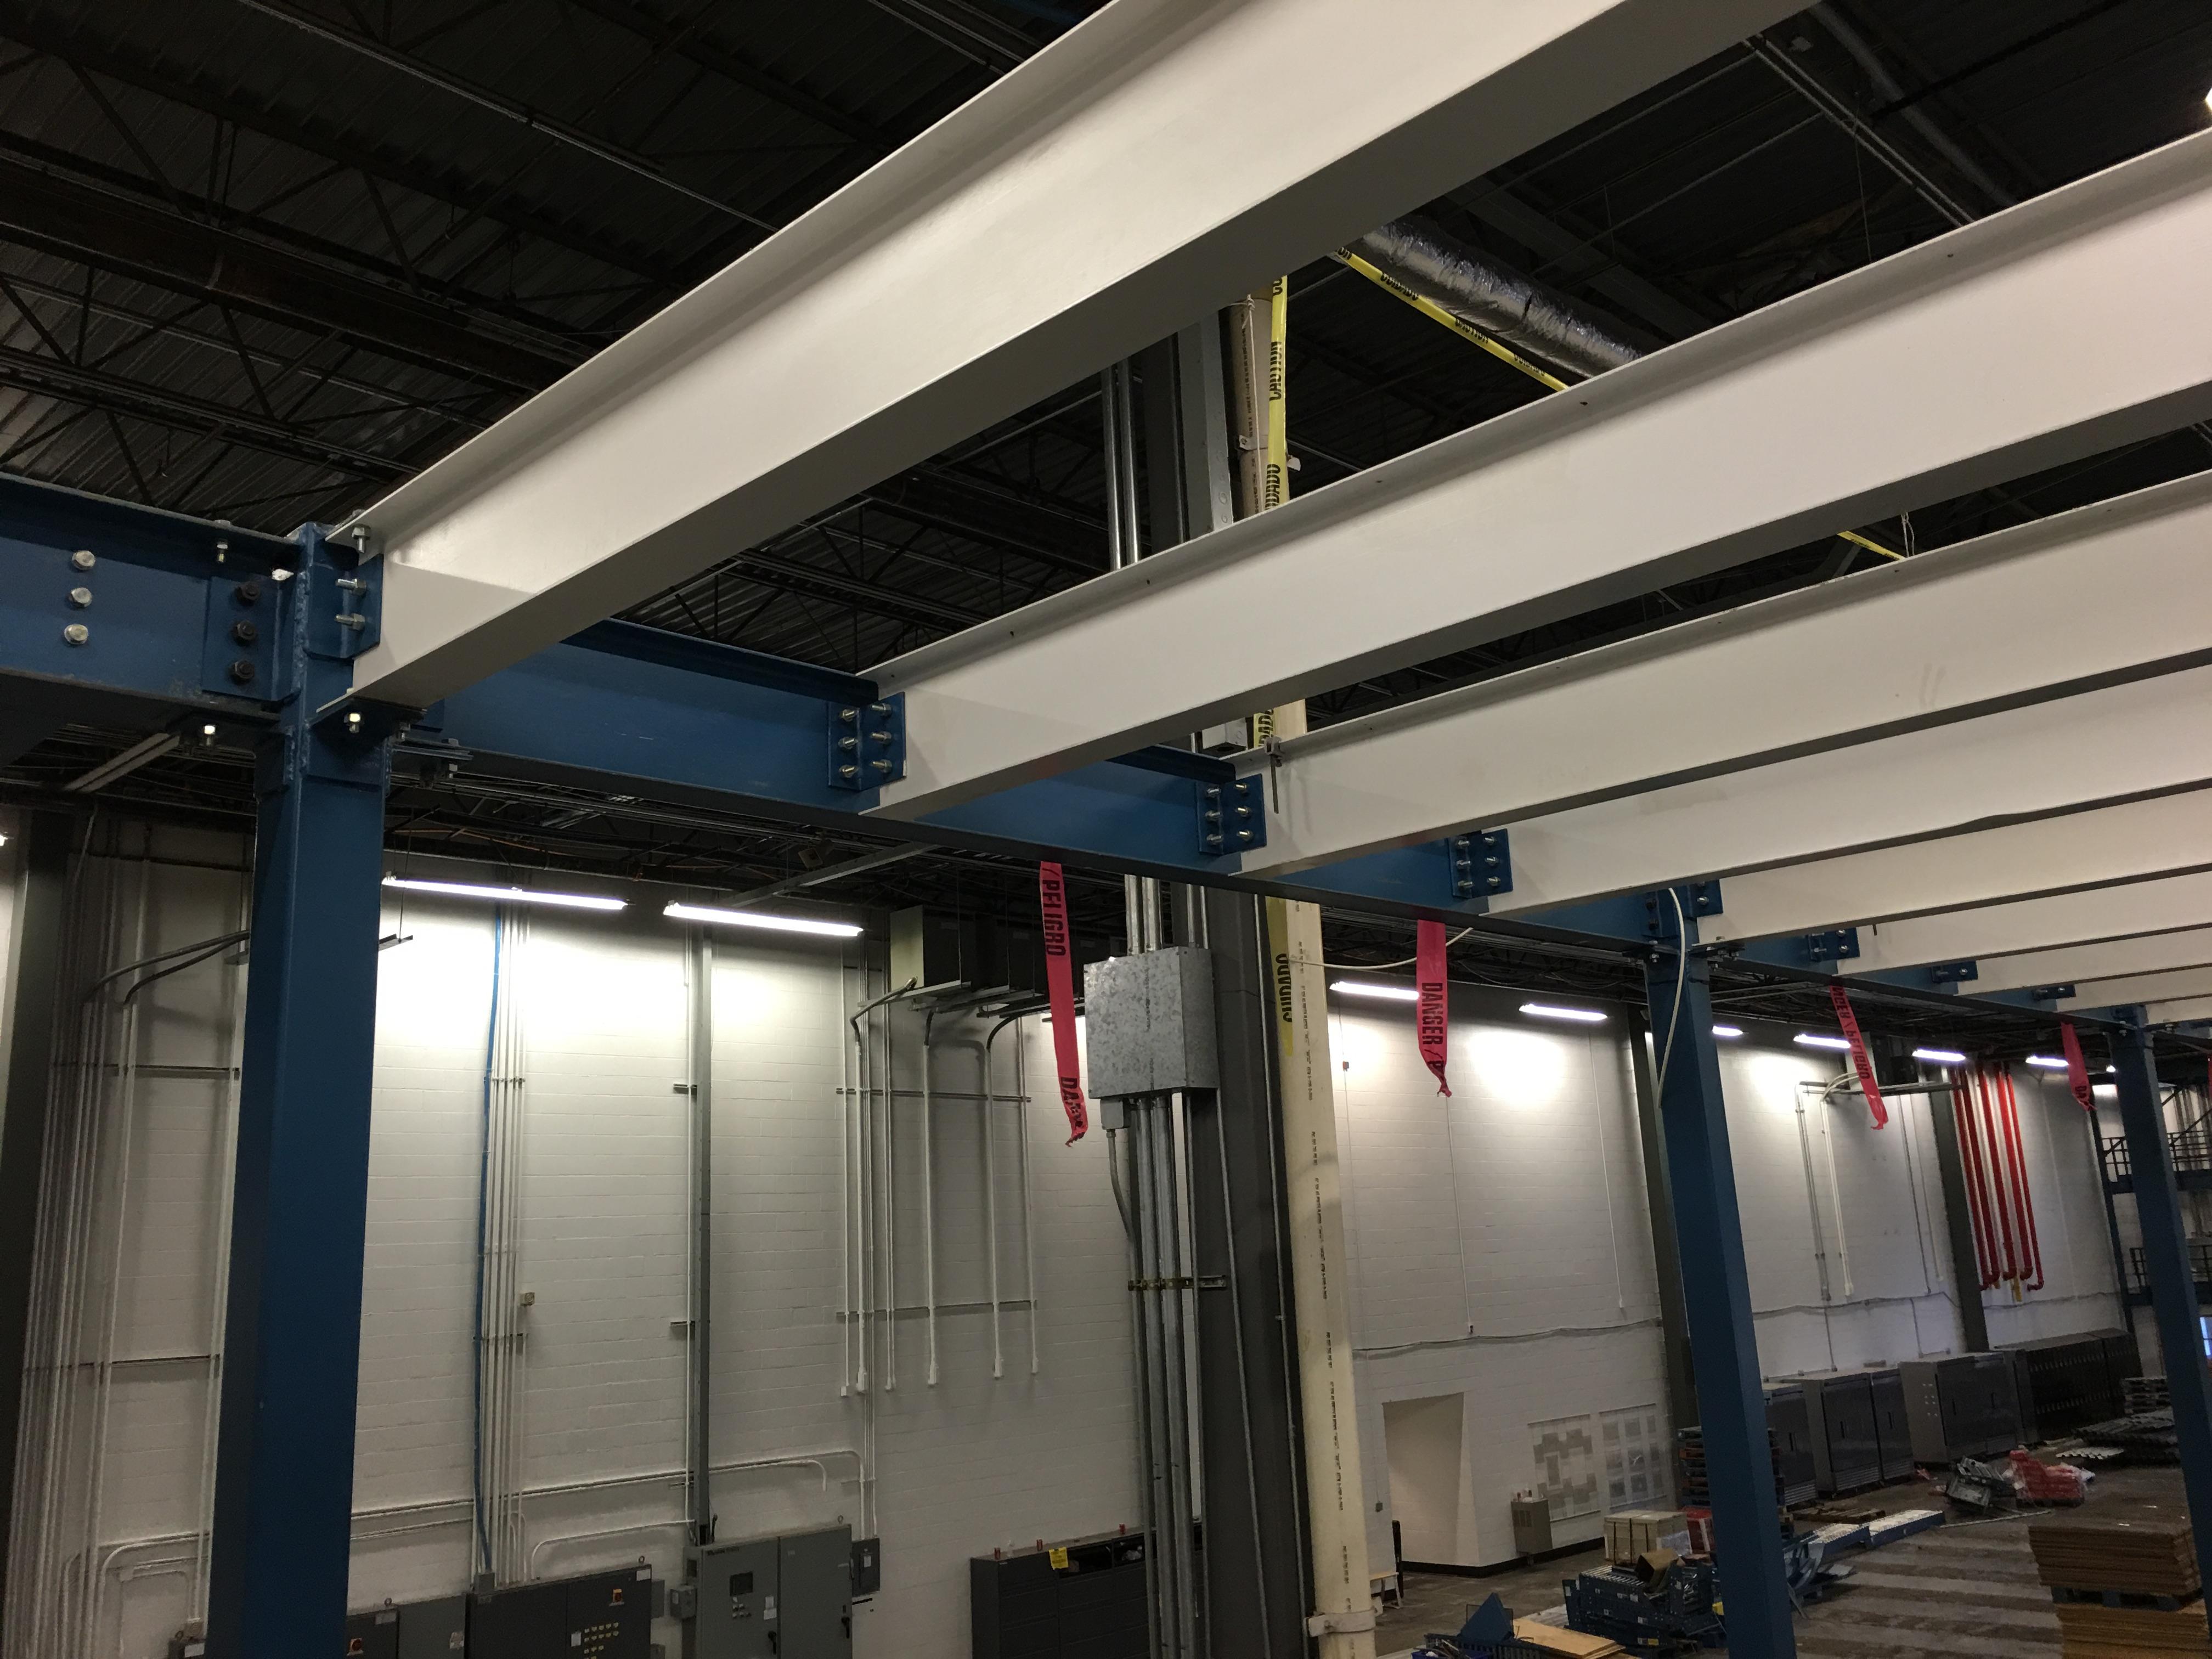 Pallet Rack, Forklift, Conveyors & Warehouse Equipment